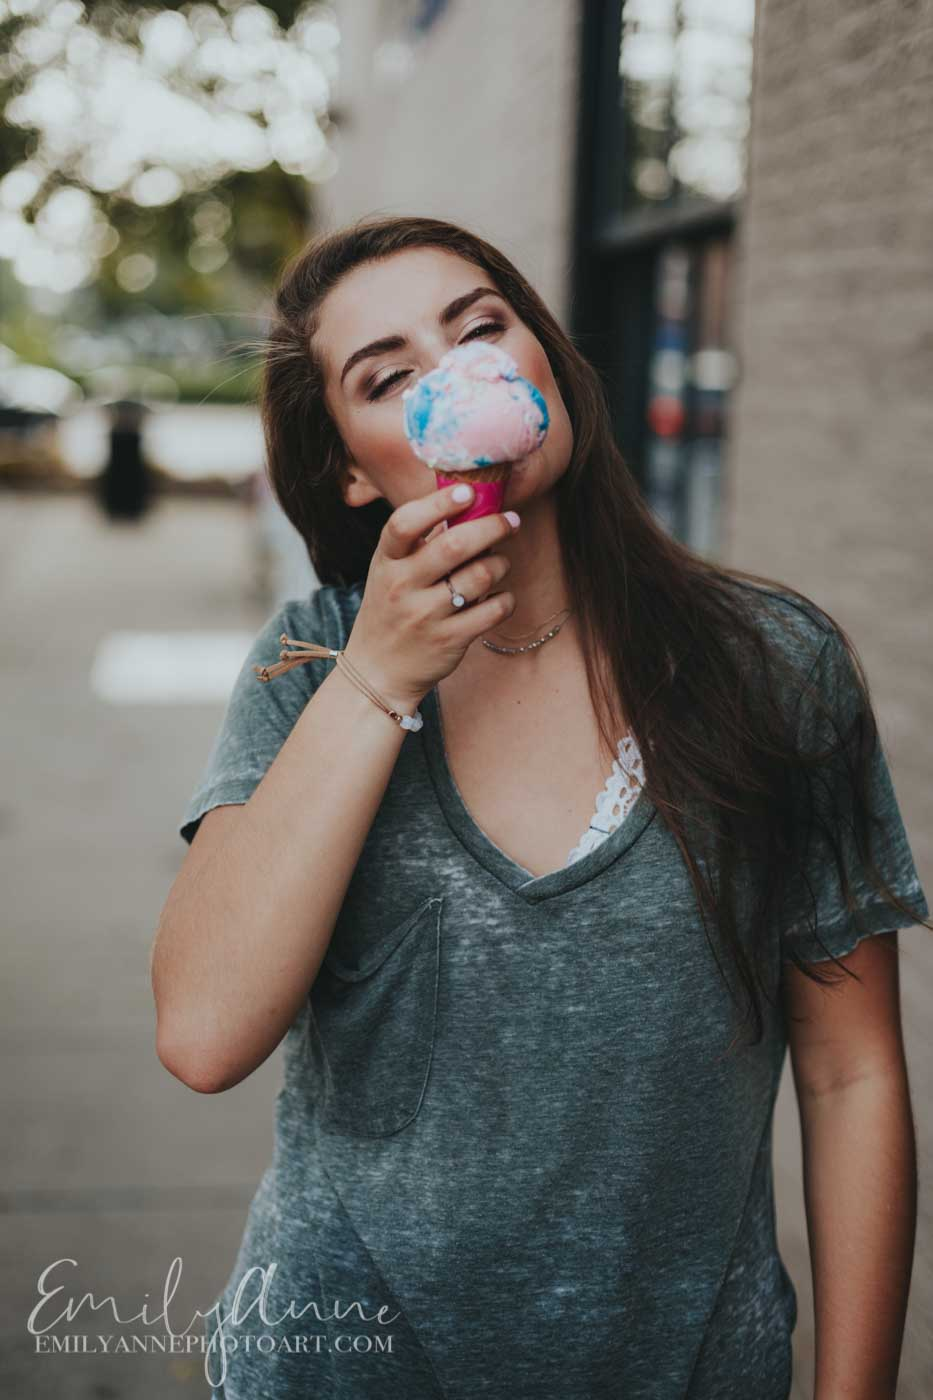 baskin Robbins photographer ice-cream cute senior portrait sweet inspiration pics